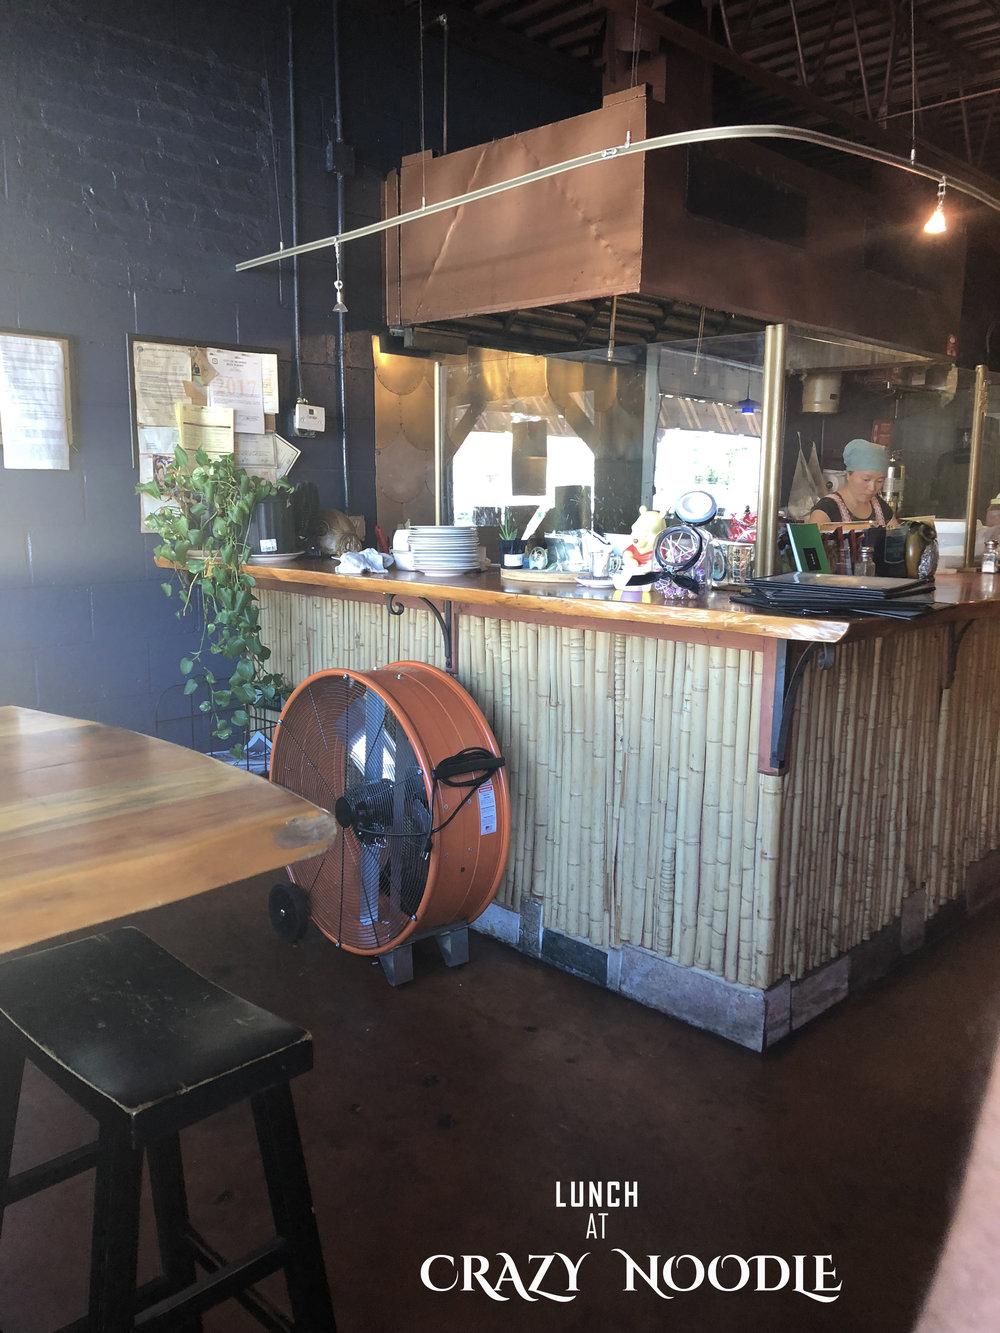 Andrea Fenise Memphis Fashion Blogger and Memphis Food Blogger reviews Crazy Noodle restaurant in Midtown Memphis